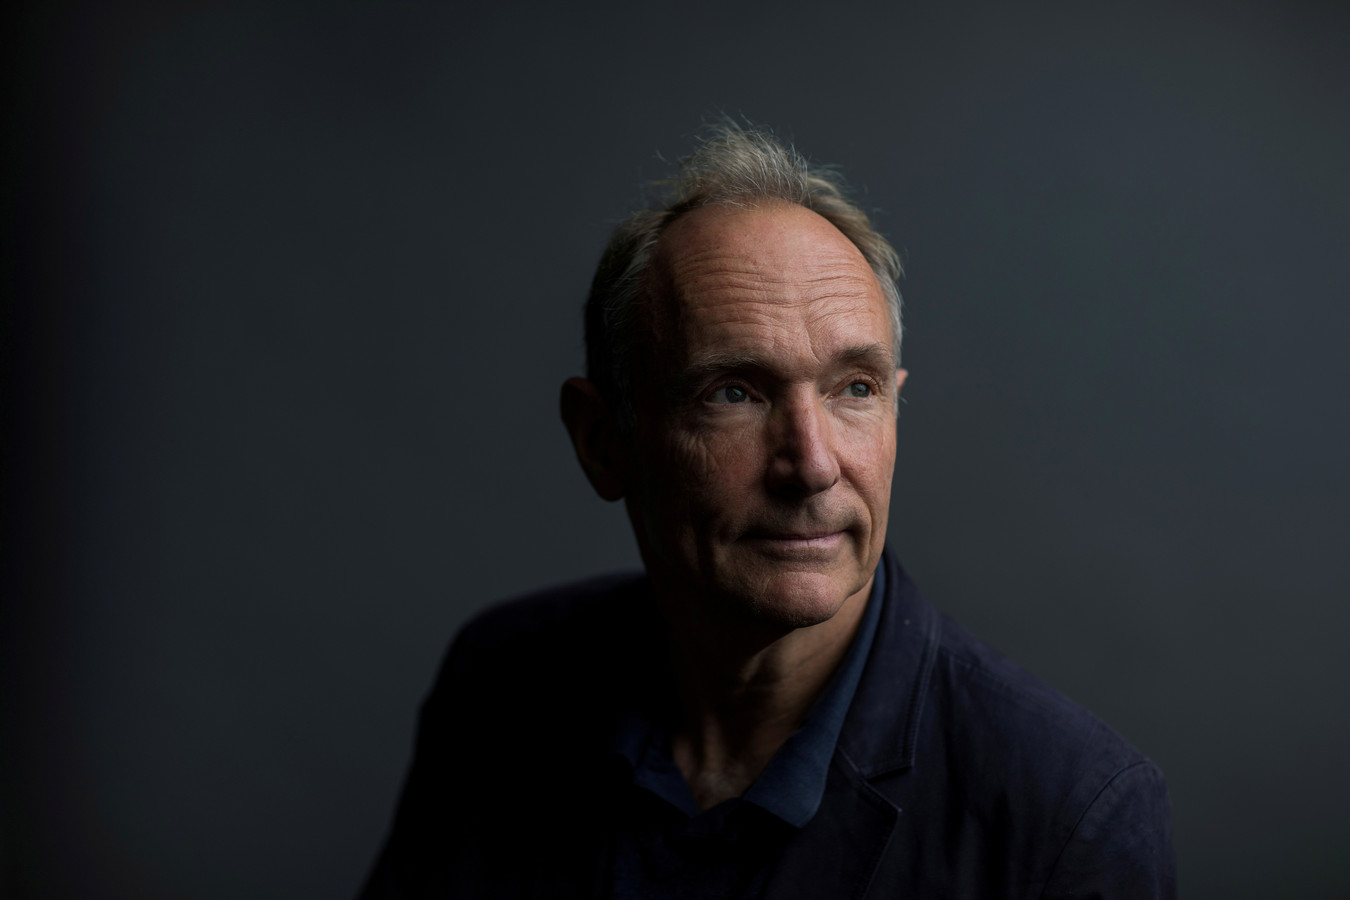 Tim Berners-Lee (27 oktober 2018)